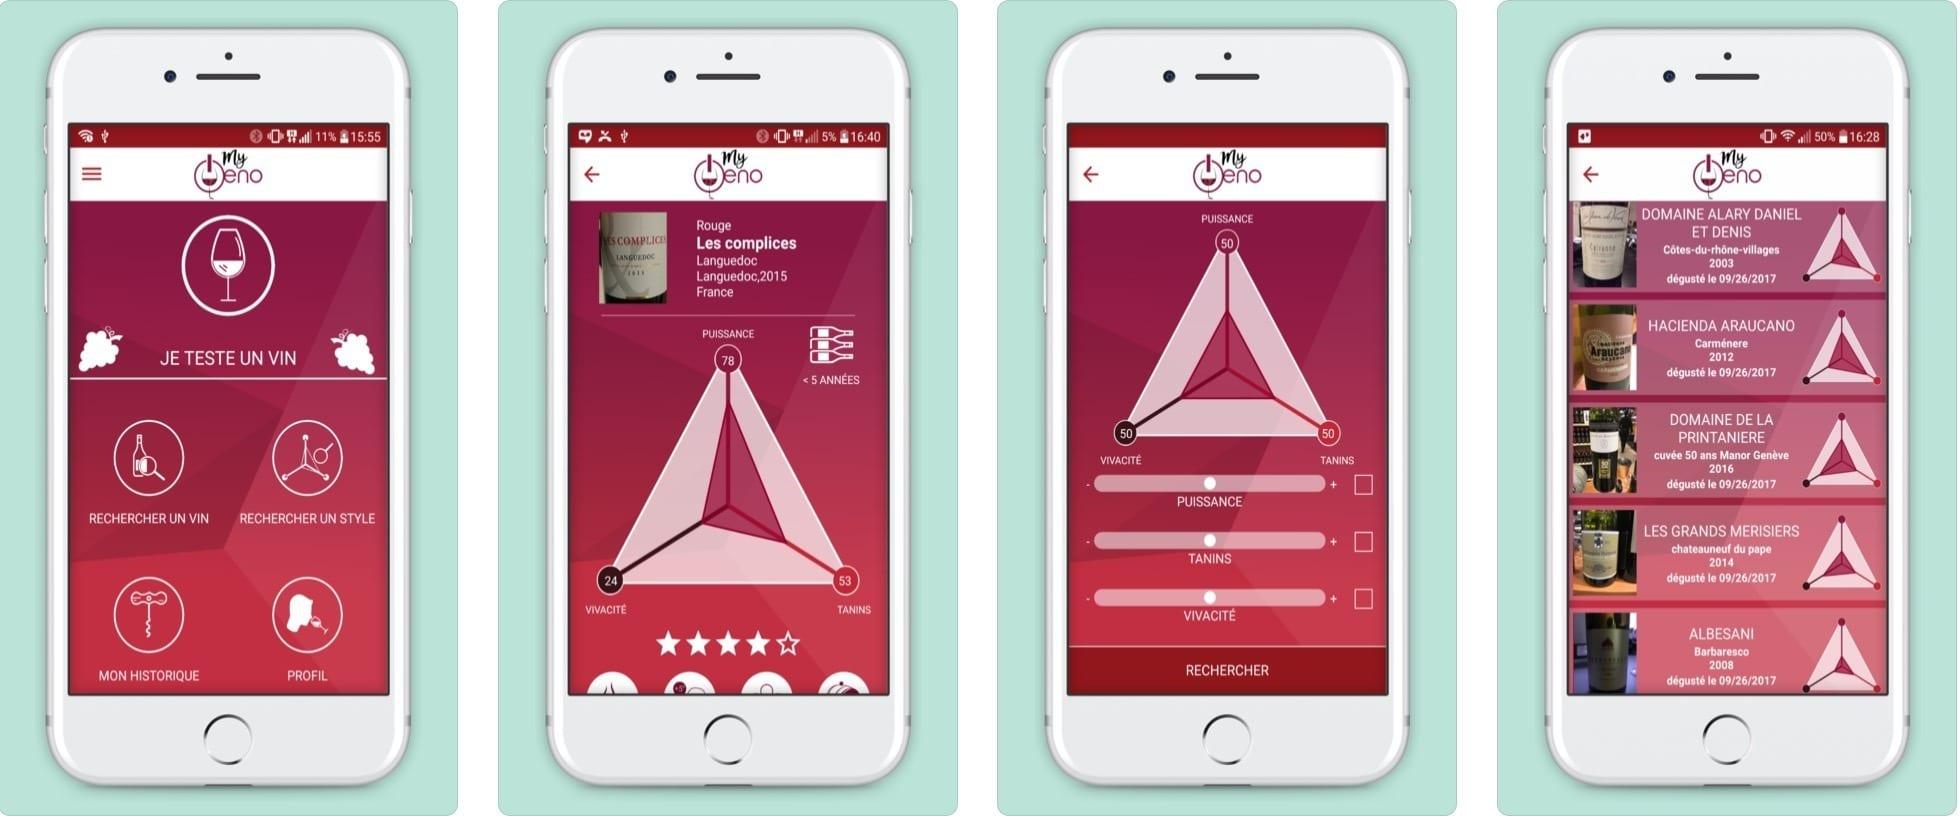 my oeno app mobile analyse de vin